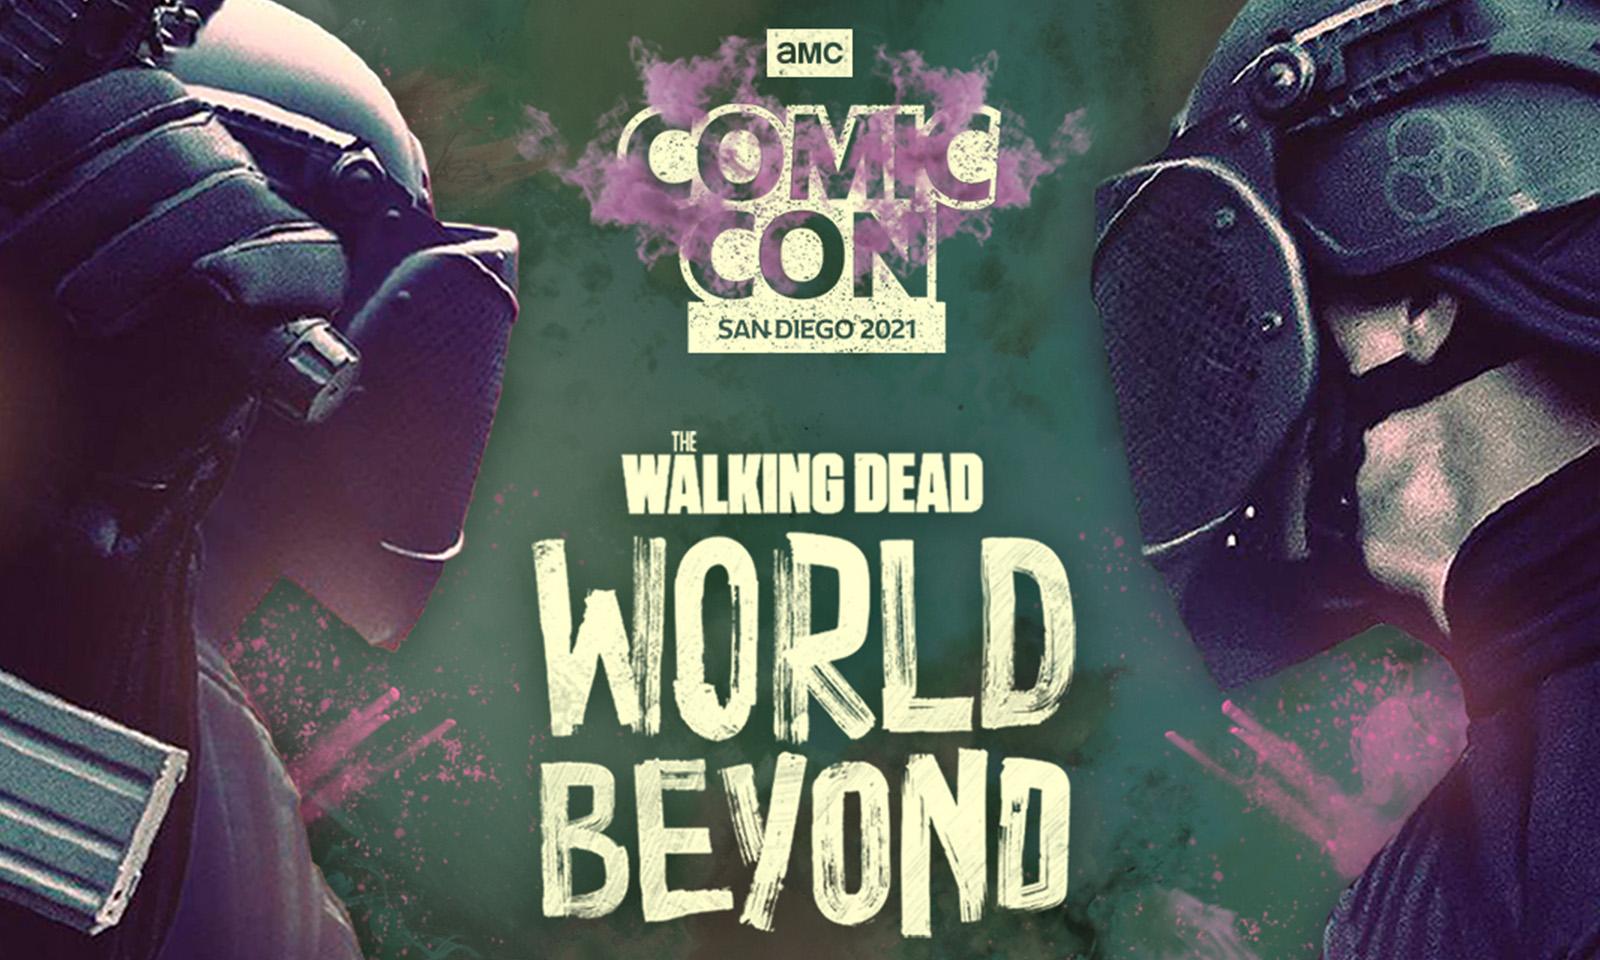 Arte de The Walking Dead: World Beyond para a San Diego Comic Con 2021